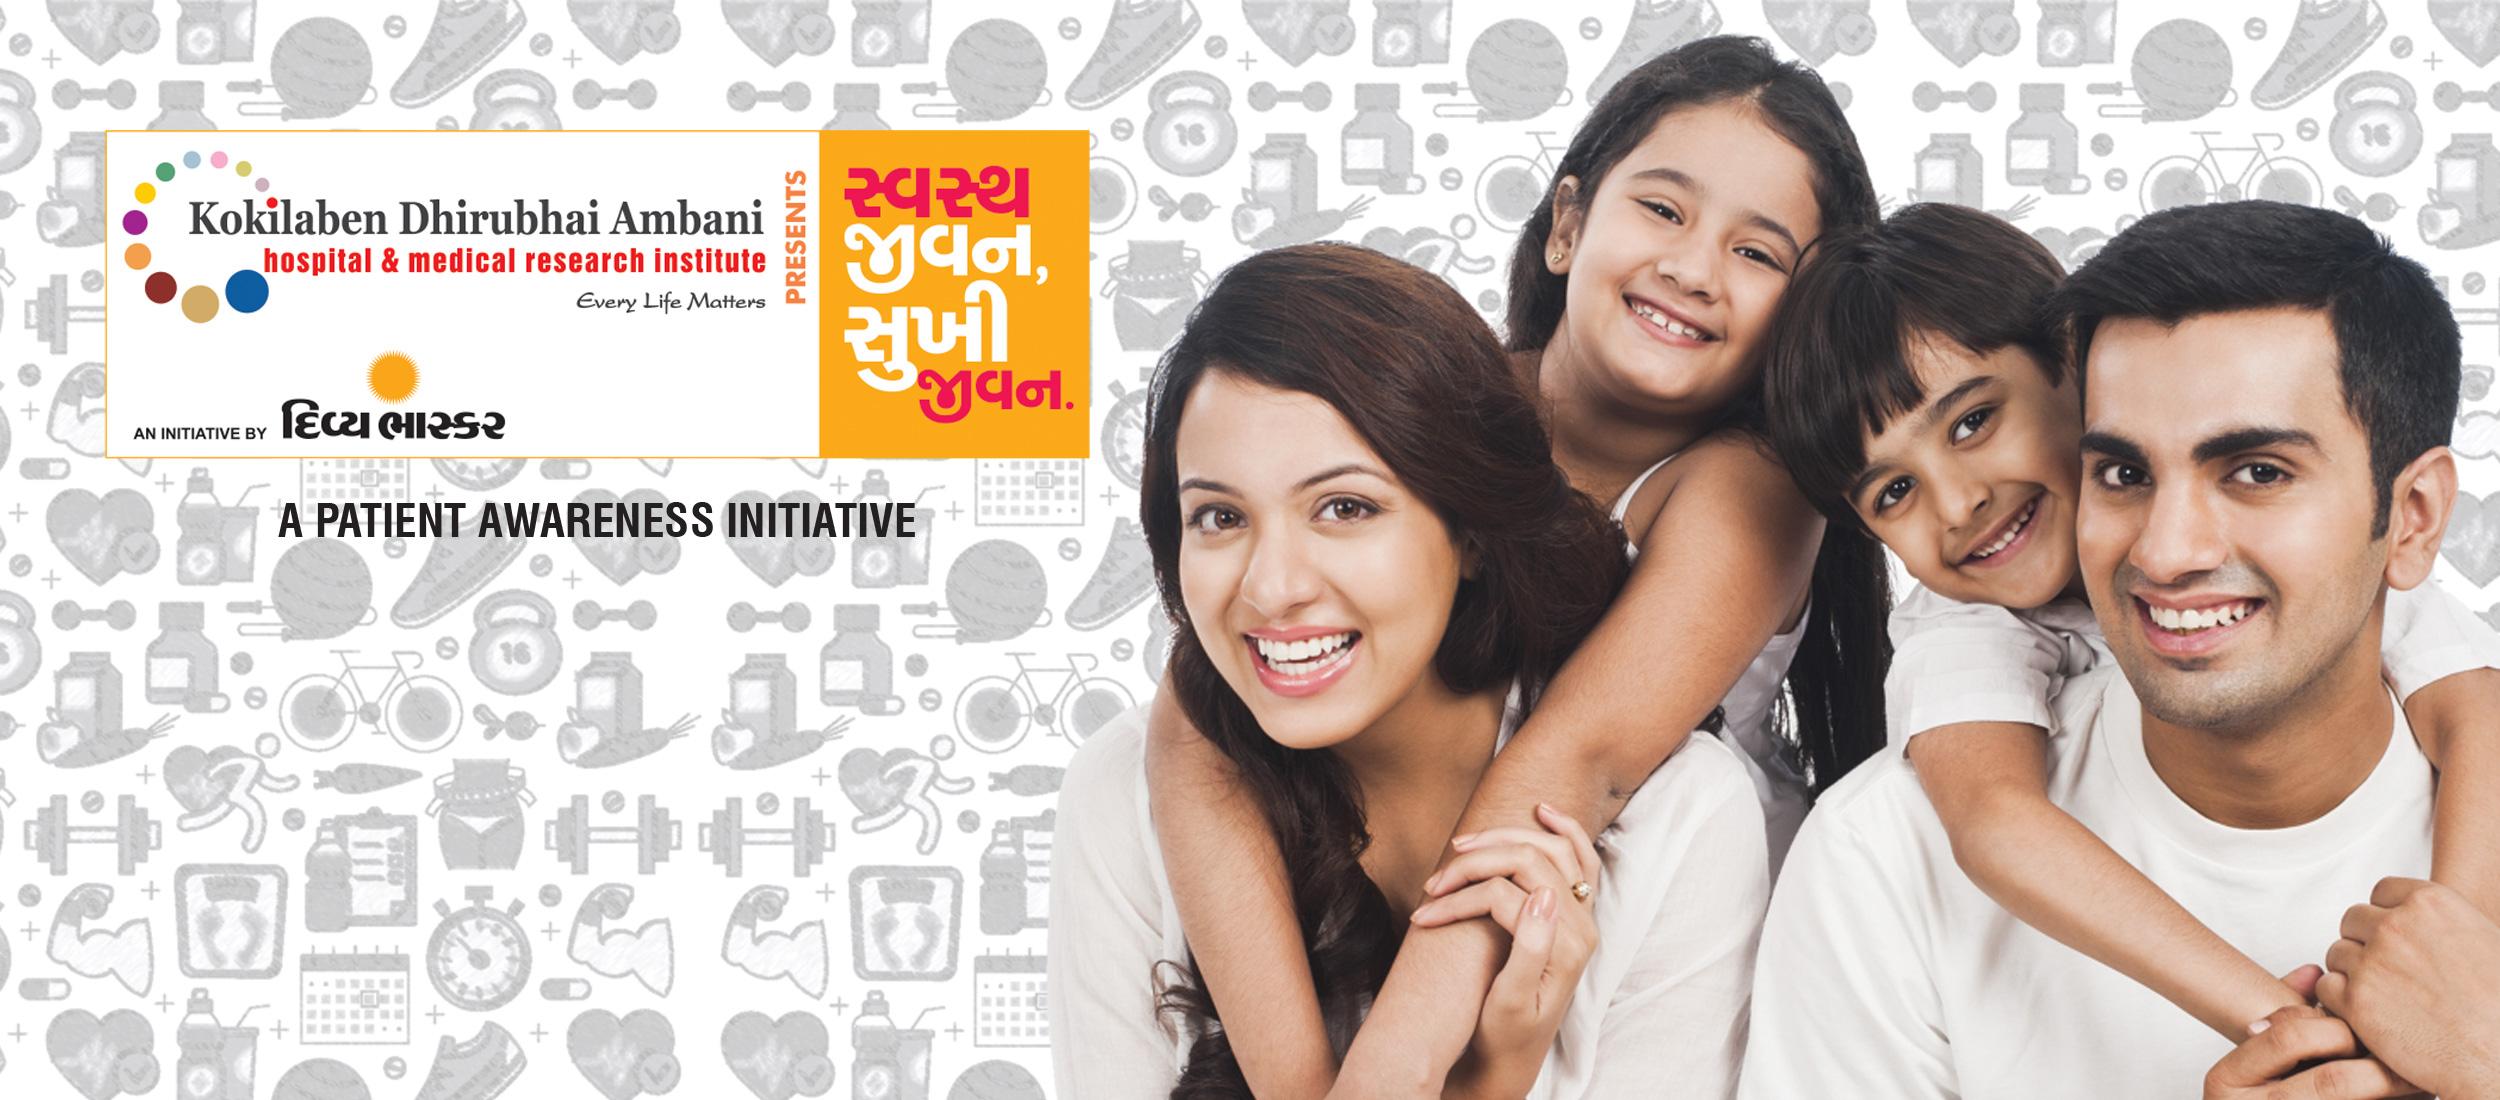 Kokilaben Dhirubhai Ambani Hospital - A Patient Awareness Initiative